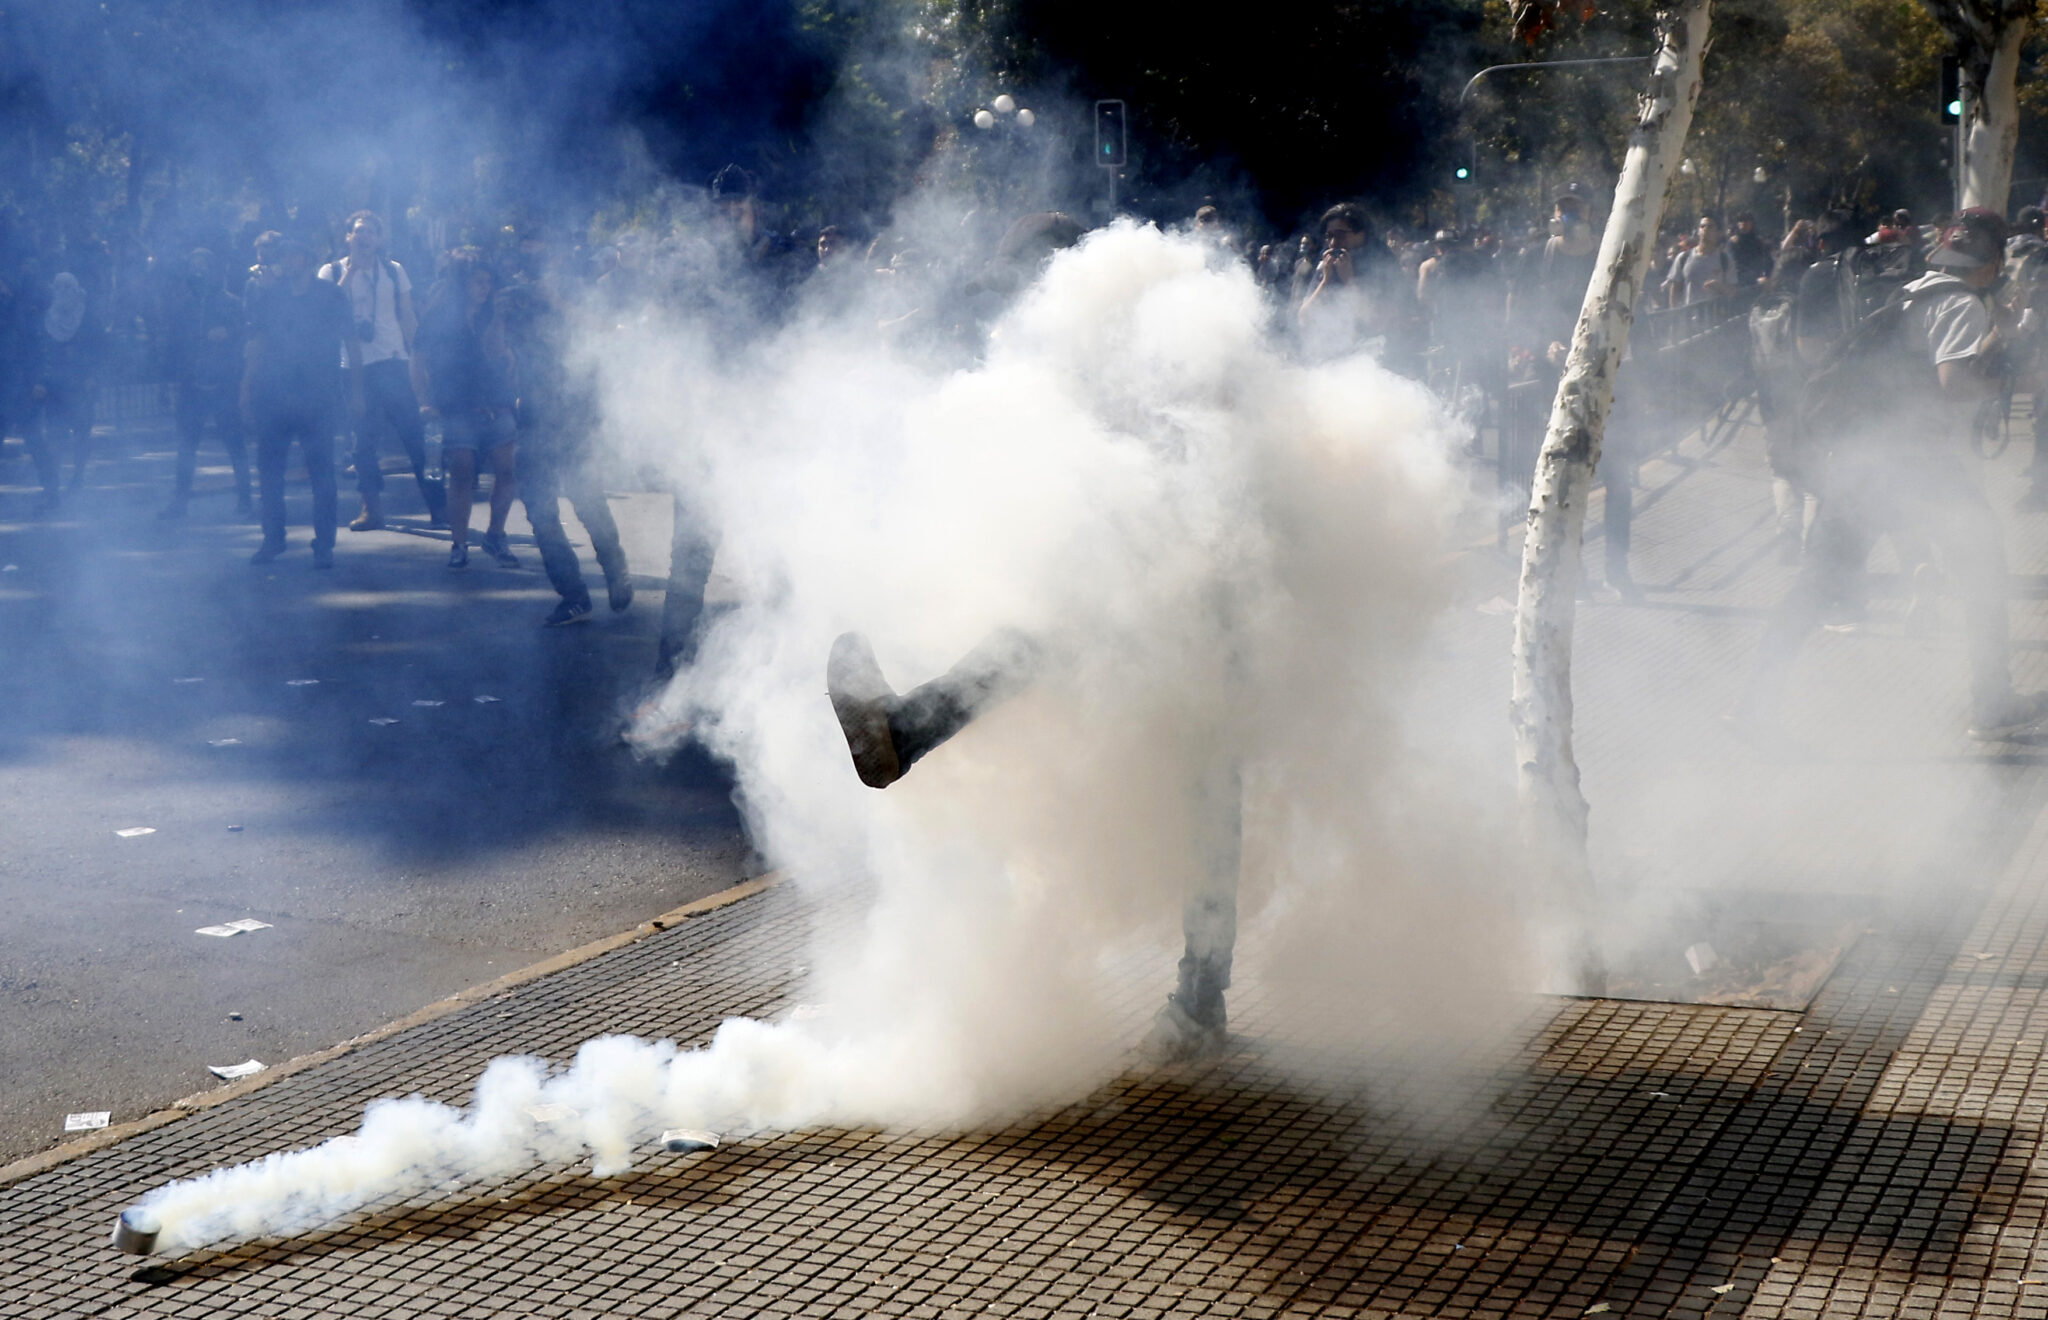 bombas lacrimogenas